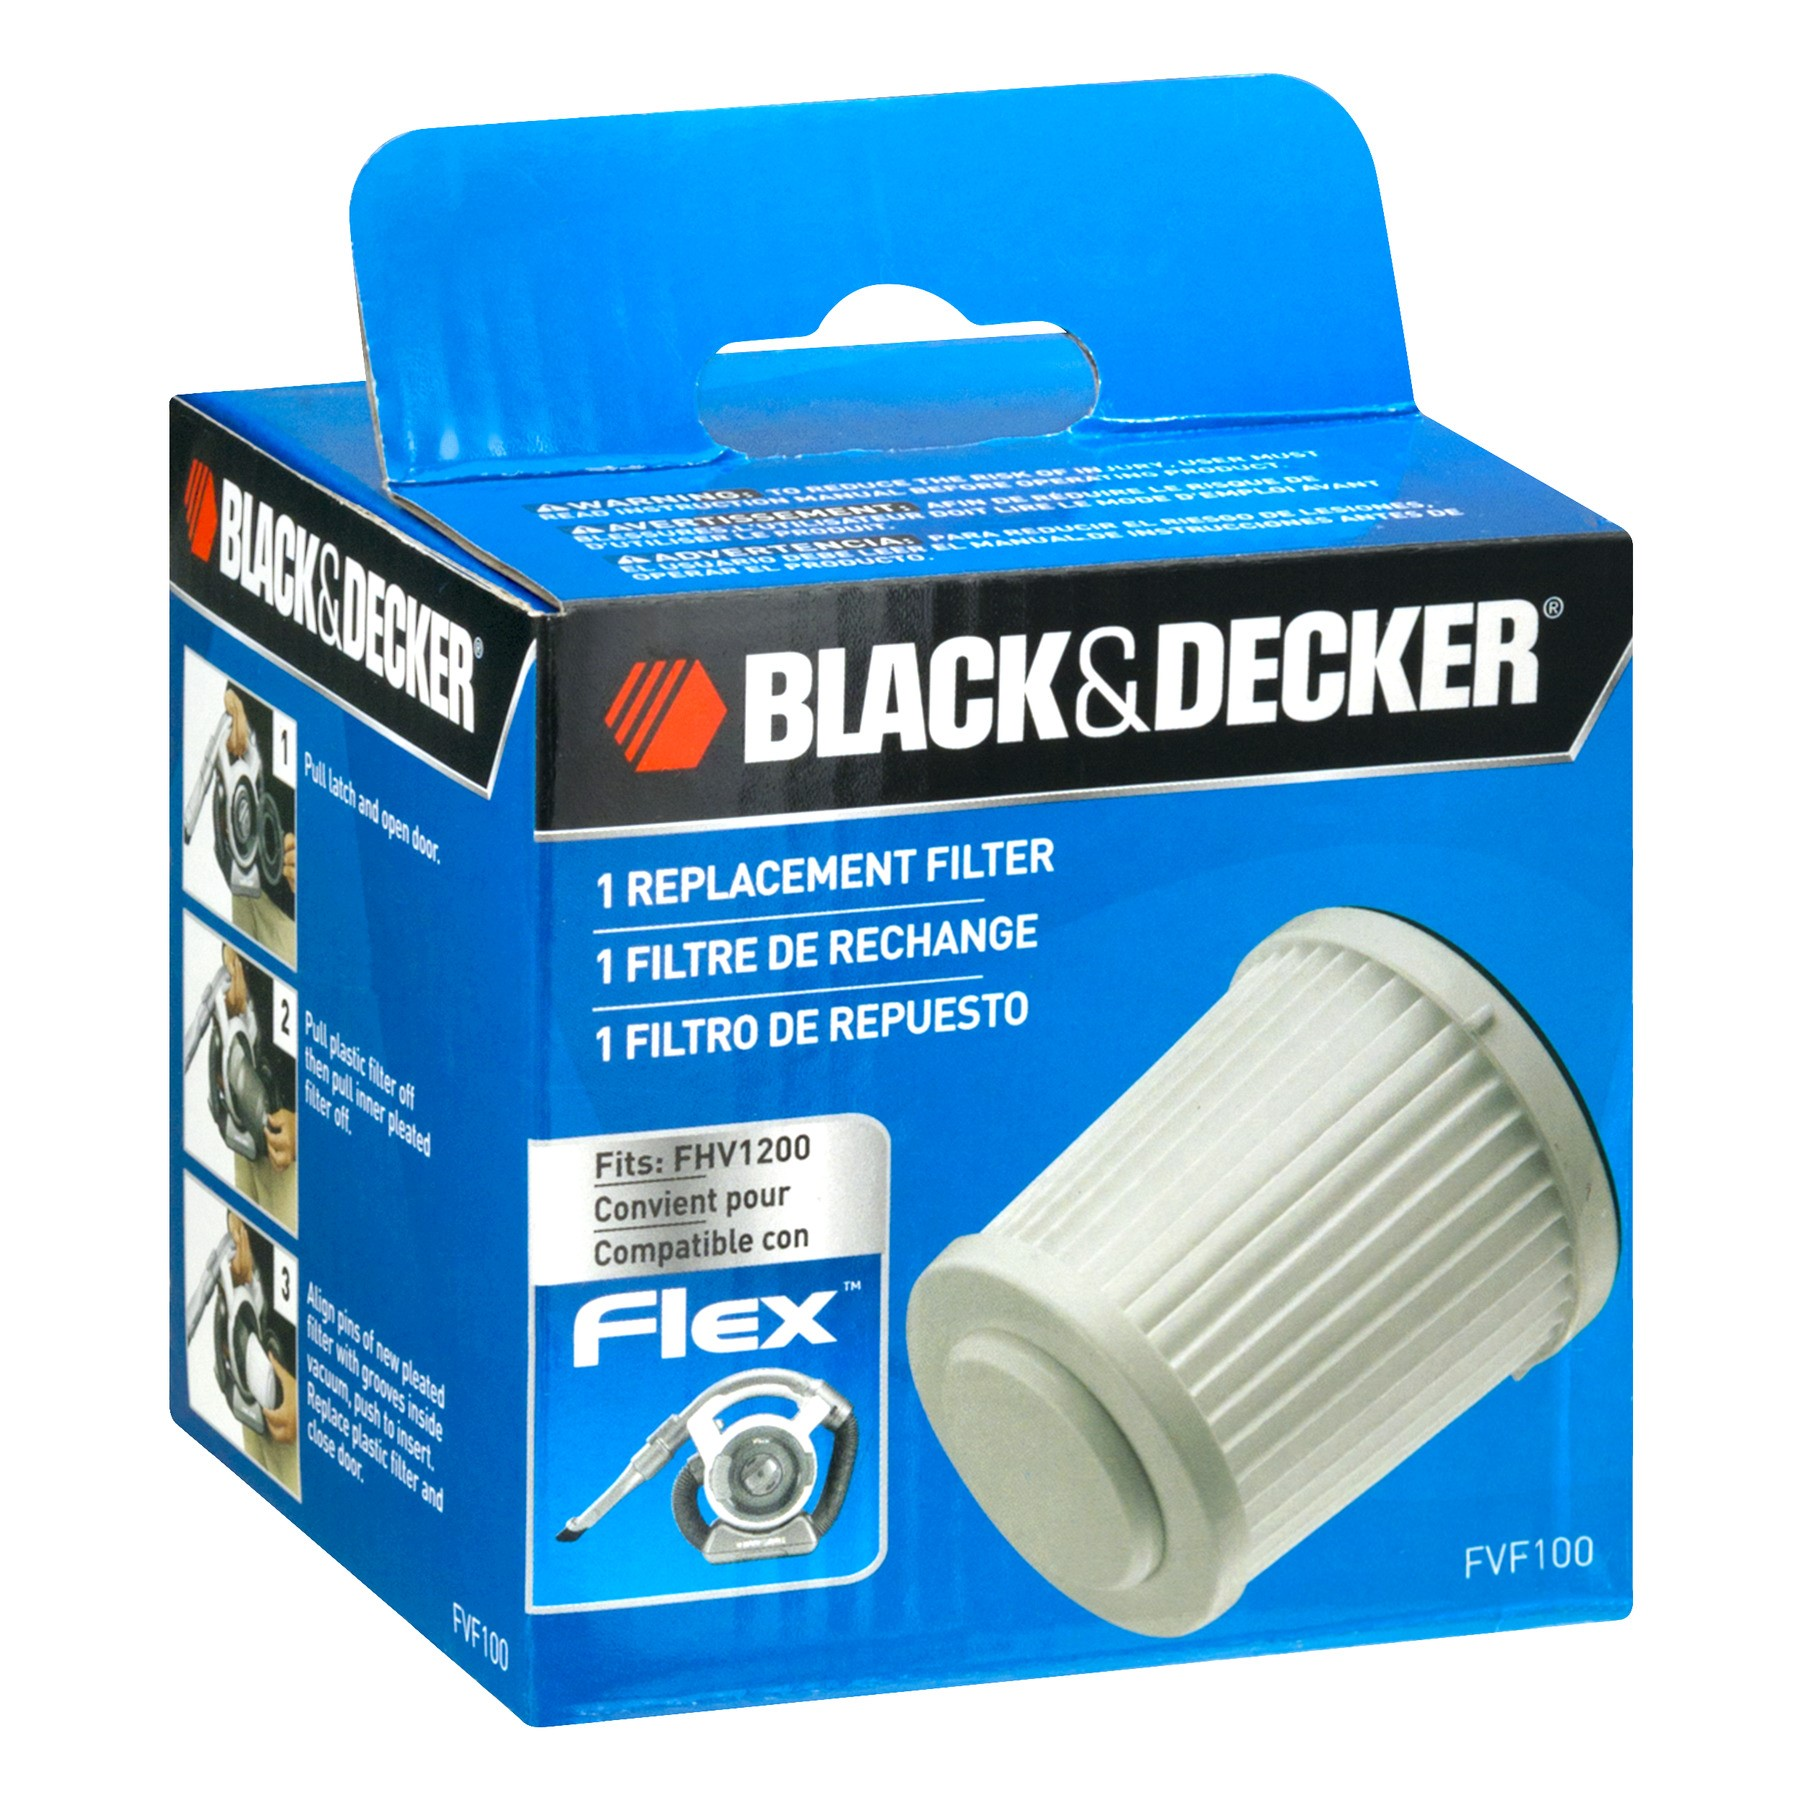 BLACK+DECKER™ FVF100 Replacement Filter for FHV1200 Flex Vacuum